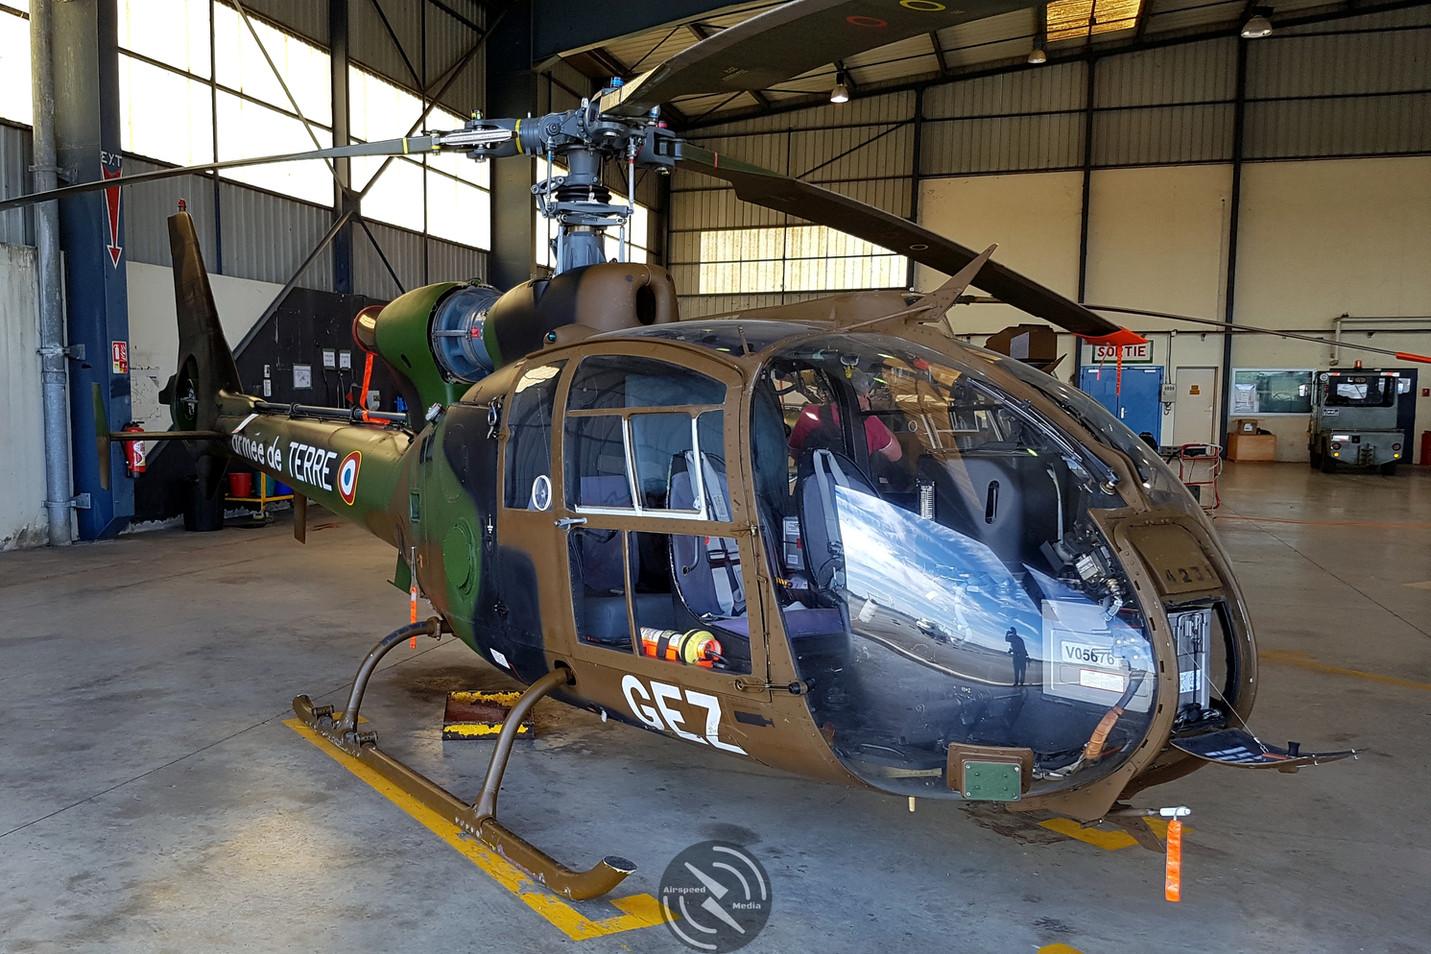 Gazelle ALAT 5th Regiment Pau May 2019